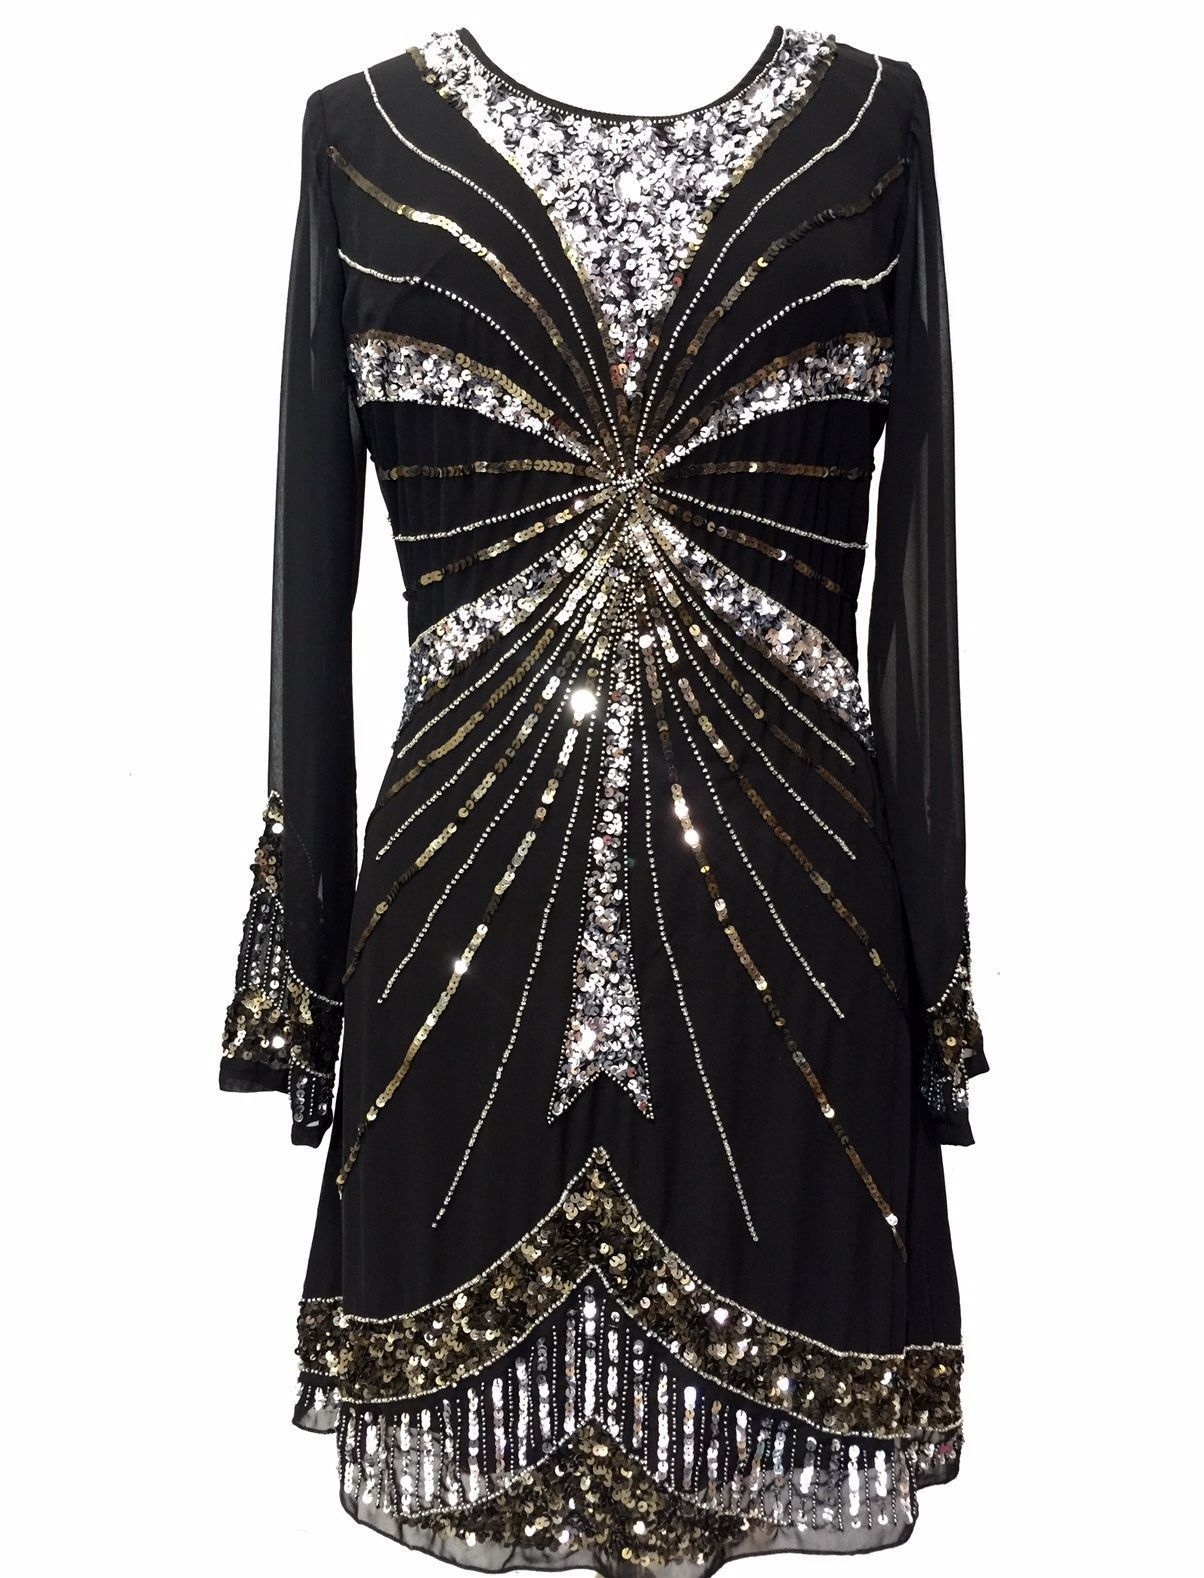 Ladies vintage dress gatsby dress evening dress s shift dress